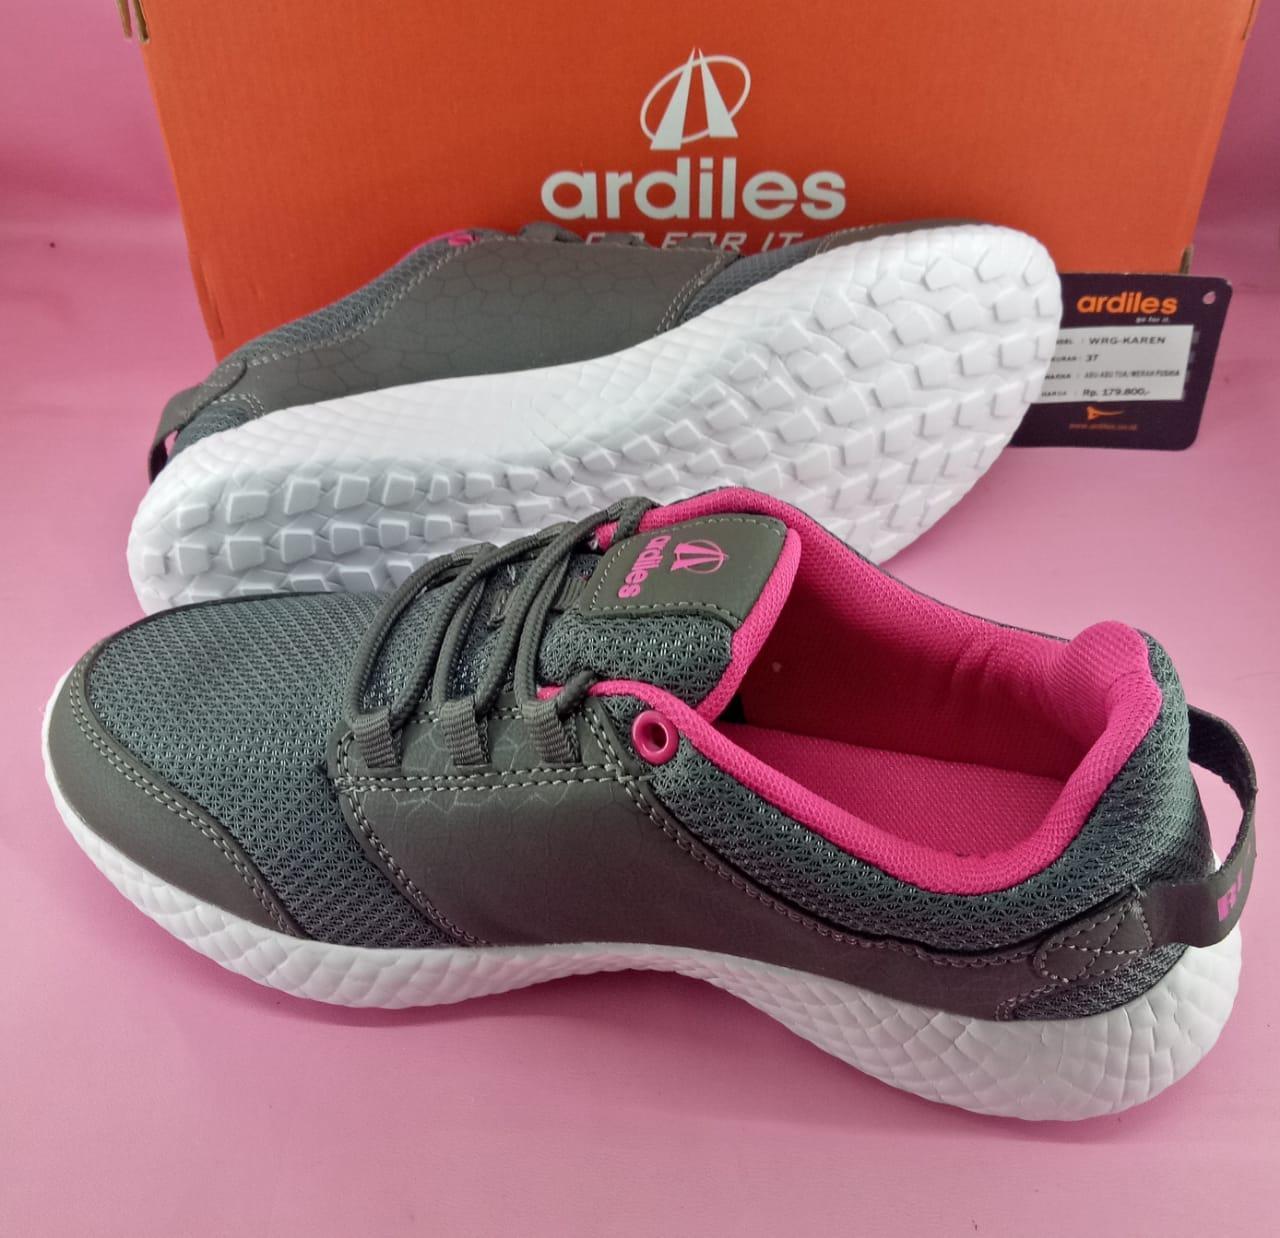 Fitur Running Shoes Ardiles Karen Abutua Fushia 37 40 Dan Harga Girls Lancia Sepatu Sekolah Hitam Abu 38 Detail Gambar Terbaru